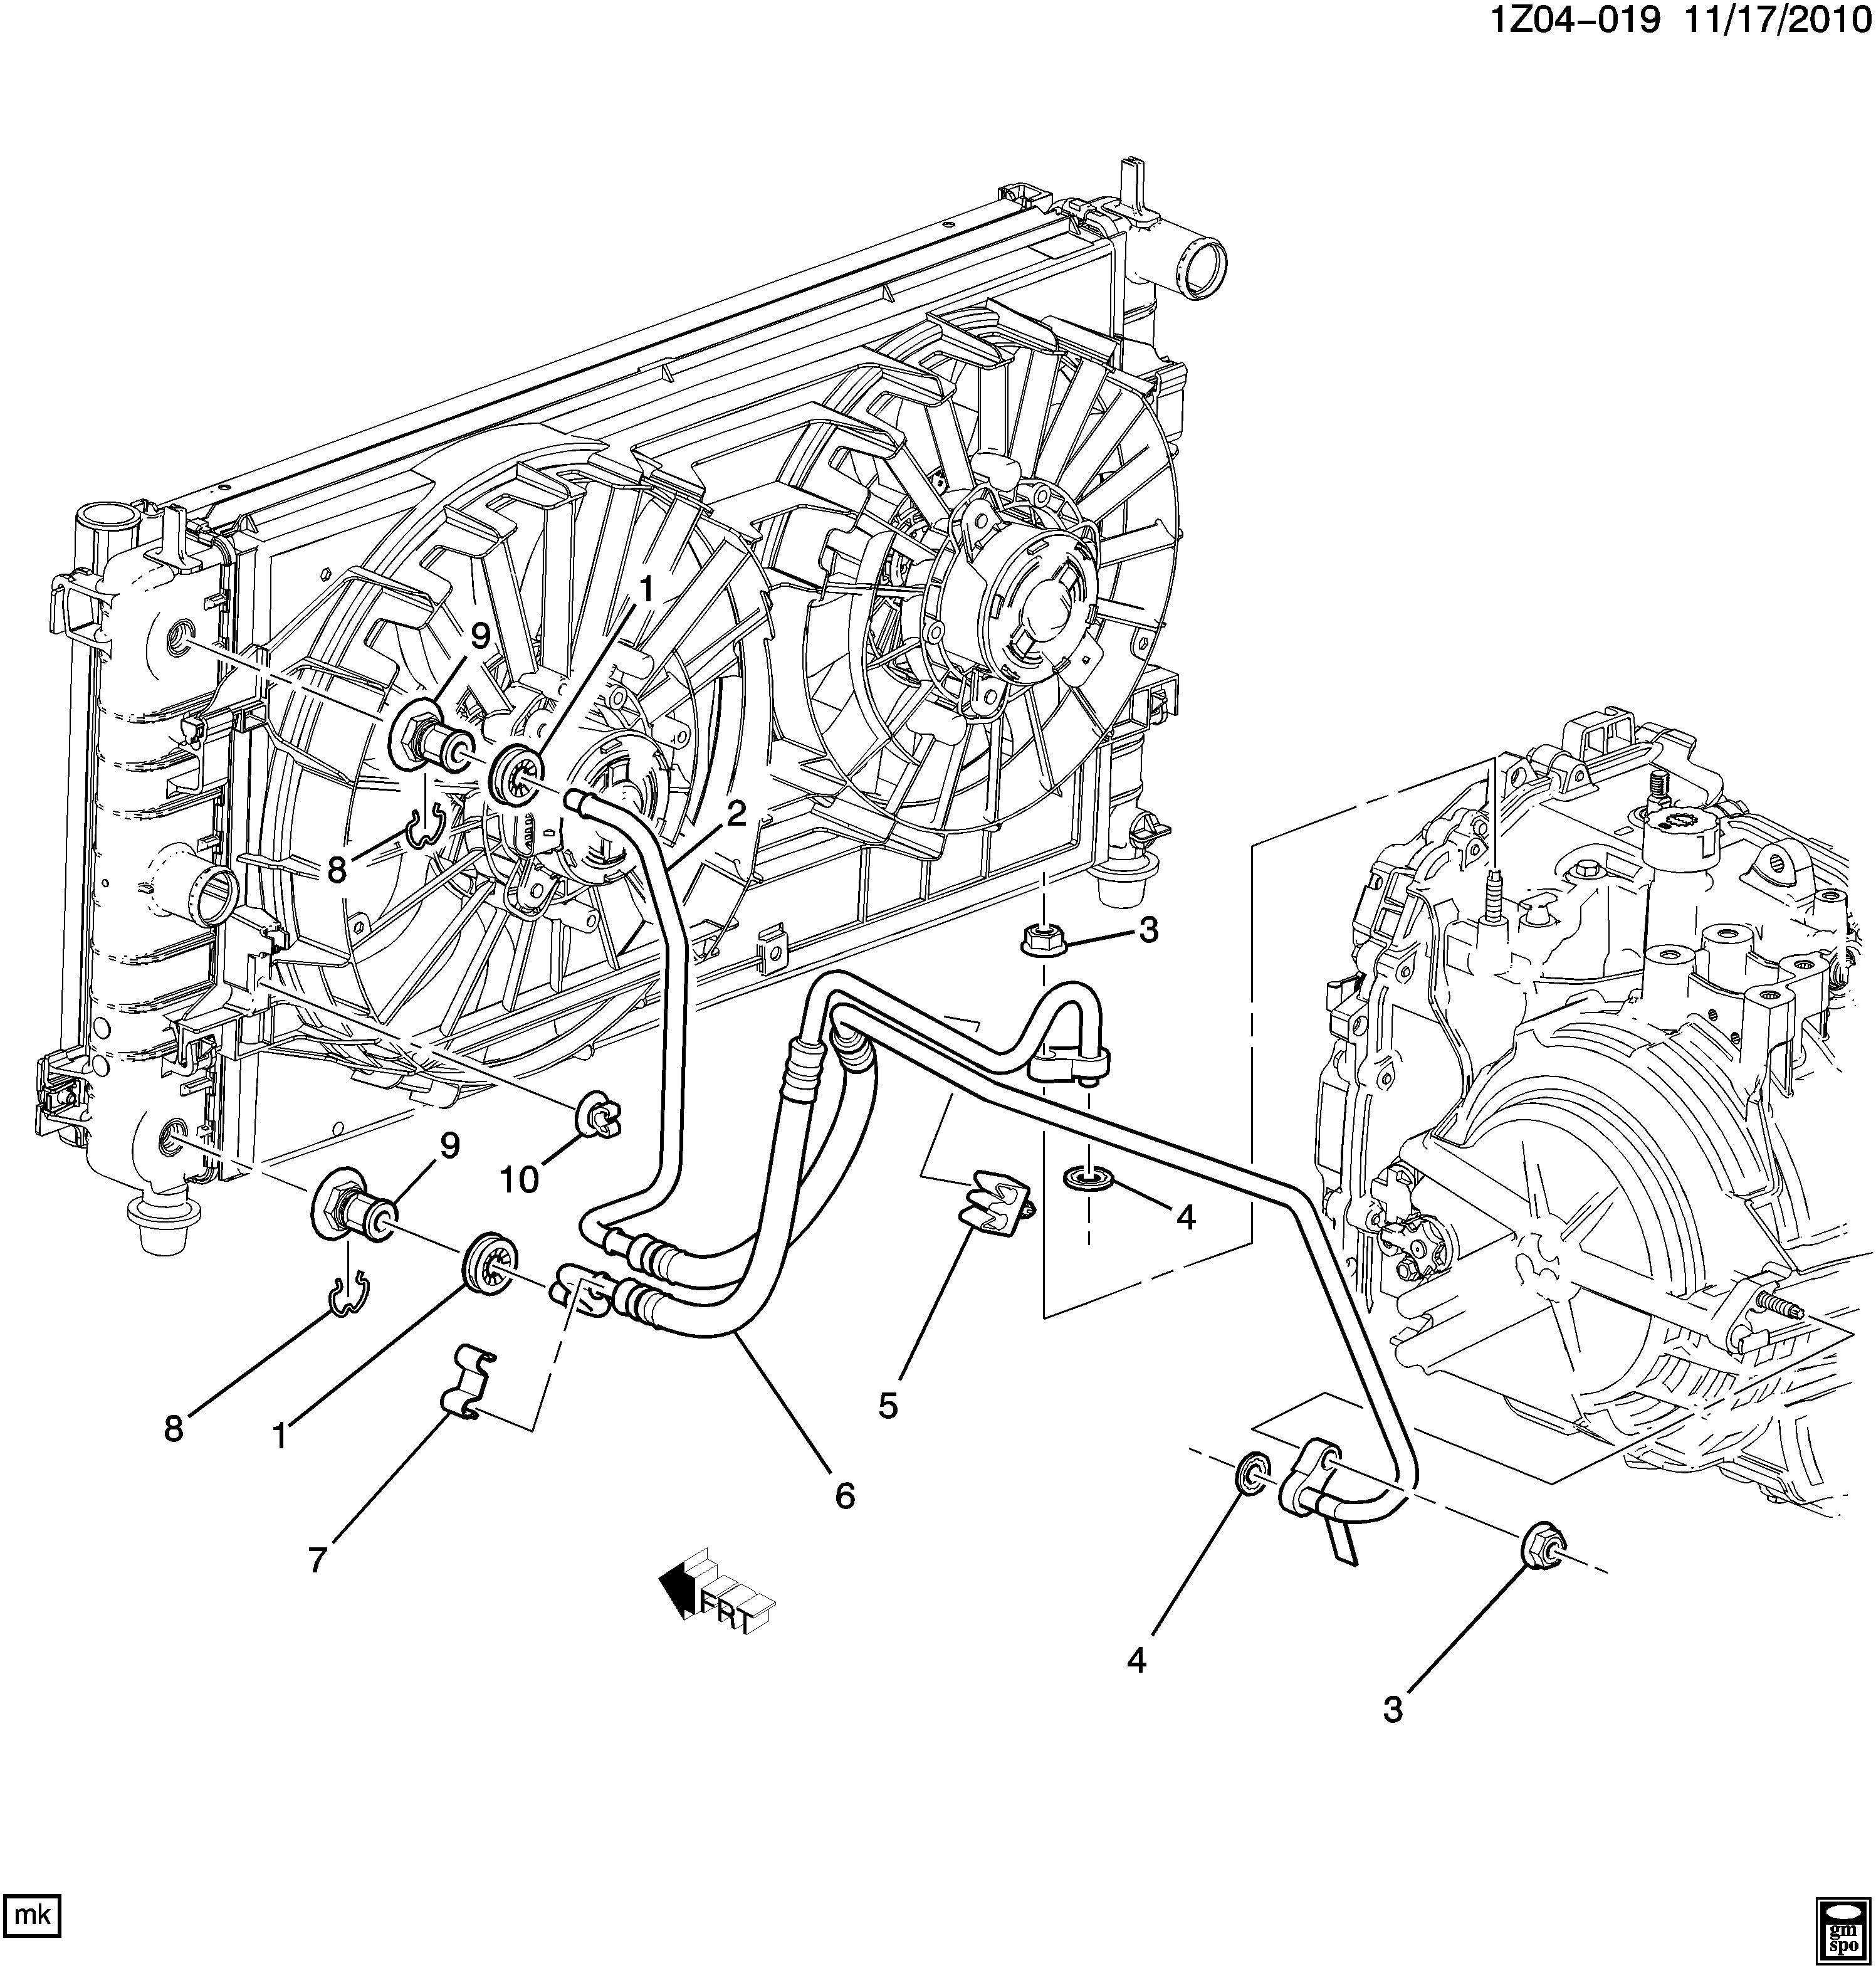 Pontiac G6 Transmission Oil Cooler Connector Fitting